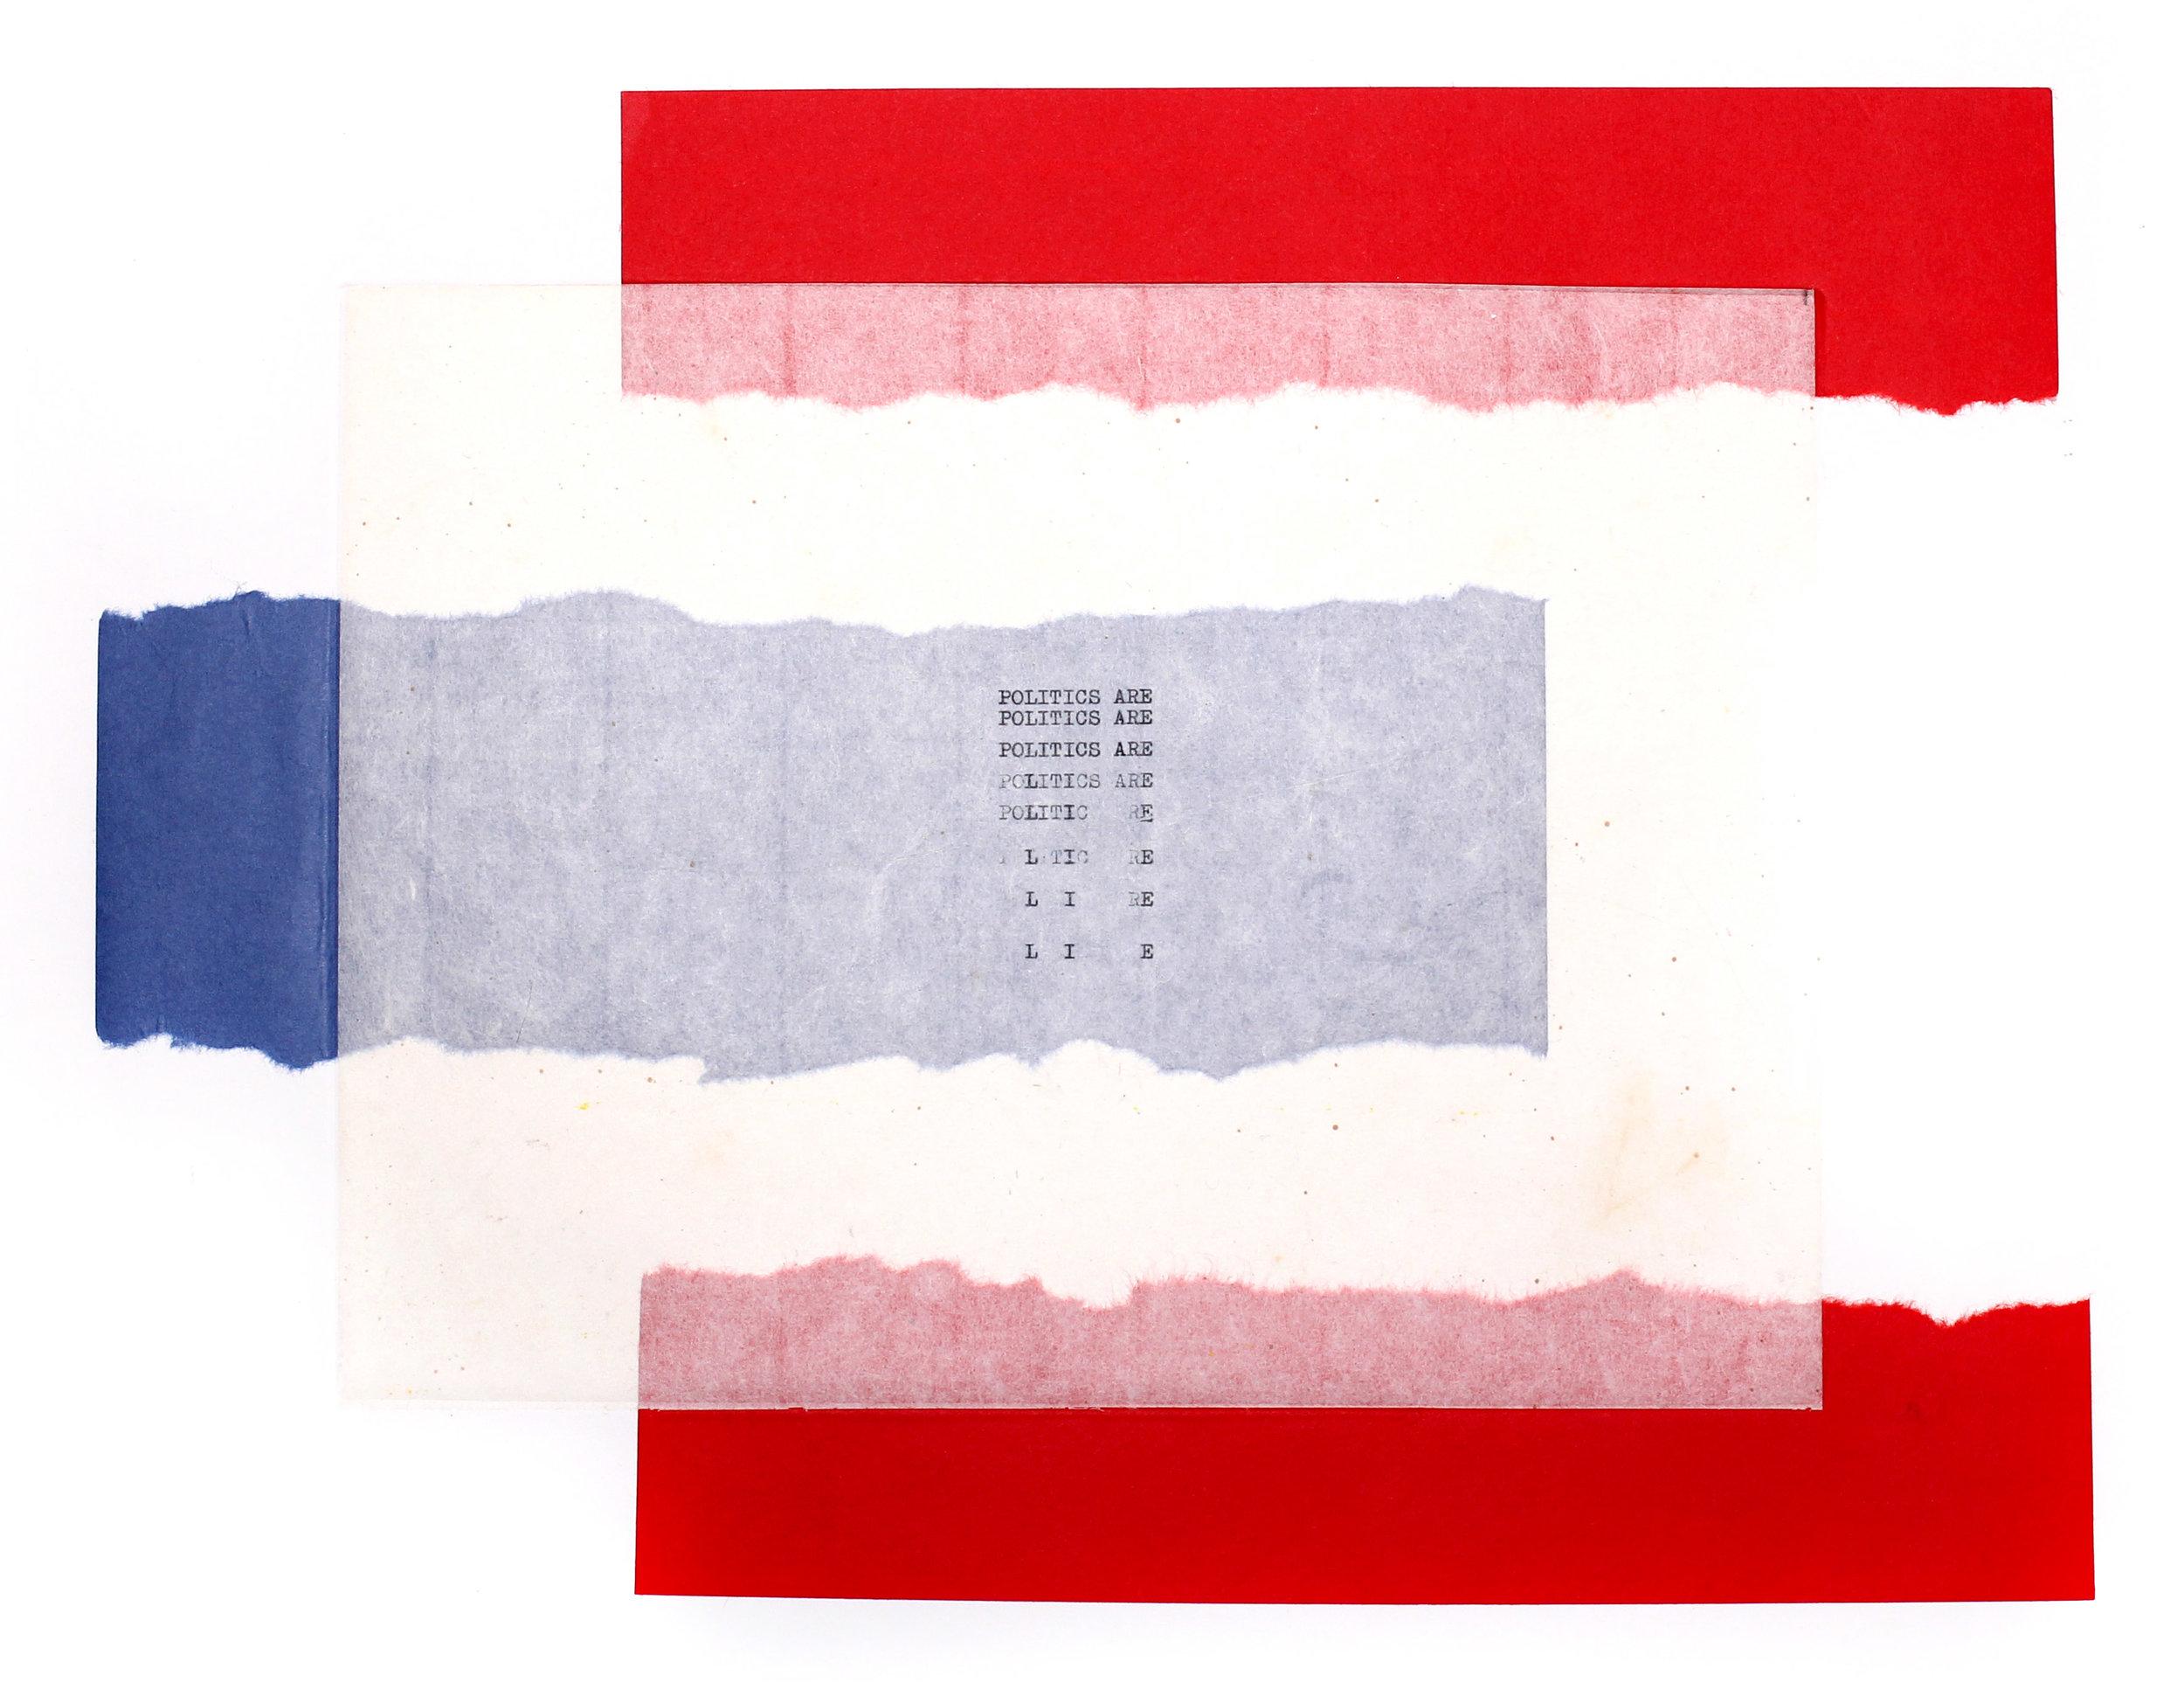 POLITICS ARE LIE (U/P), 2019, Typewriter Art with Chine-Colle, 22 x 14 inches